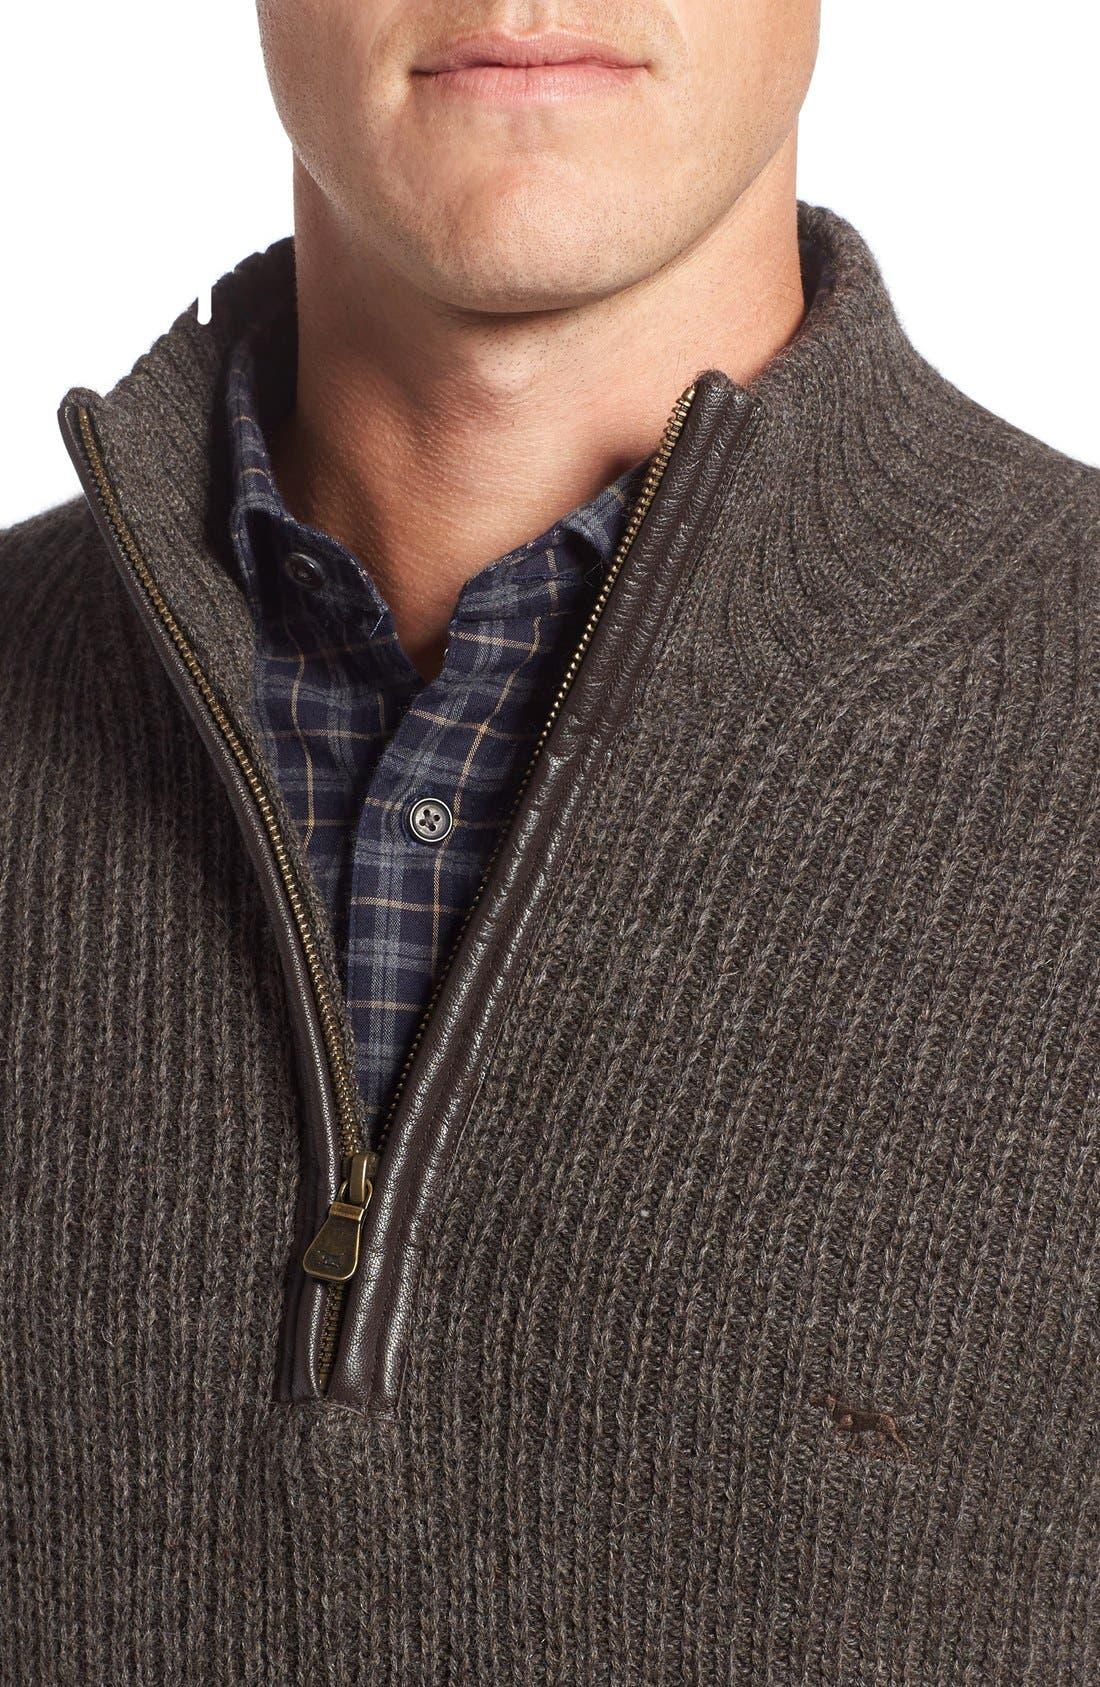 'Huka Lodge' Merino Wool Blend Quarter Zip Sweater,                             Alternate thumbnail 4, color,                             Dirt